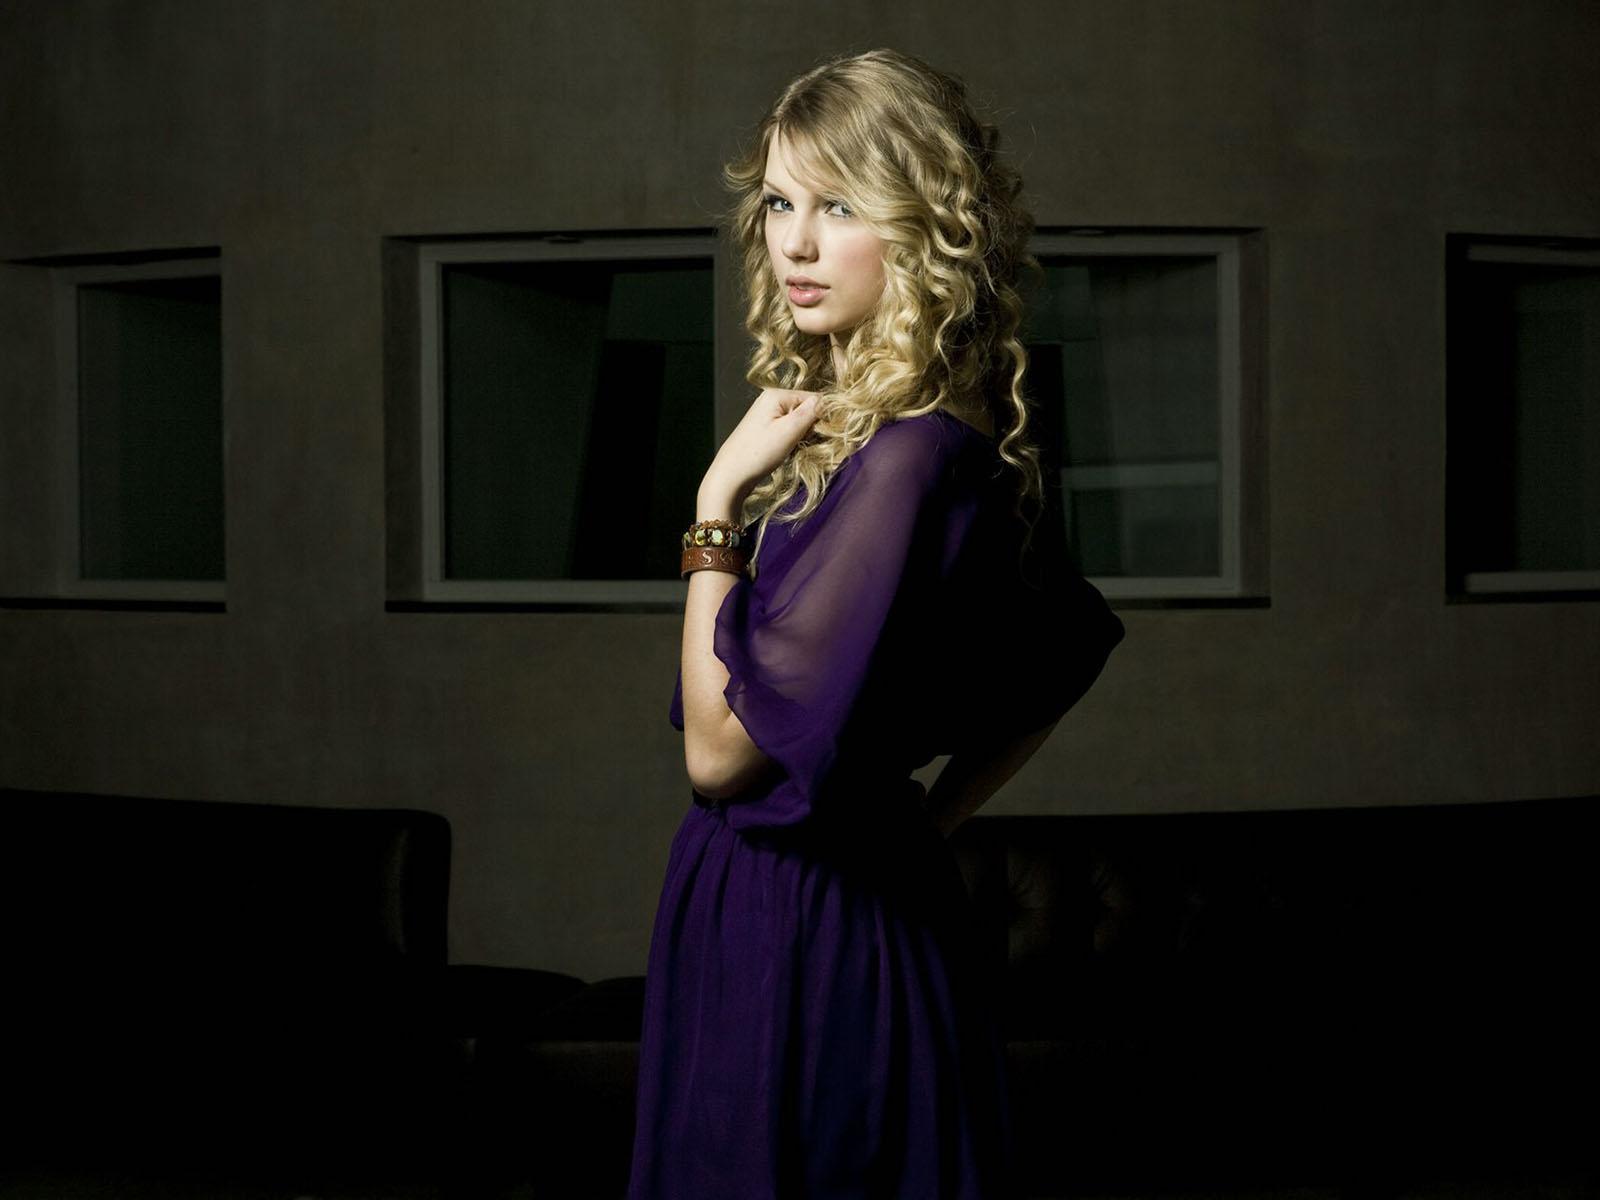 Blue,dress